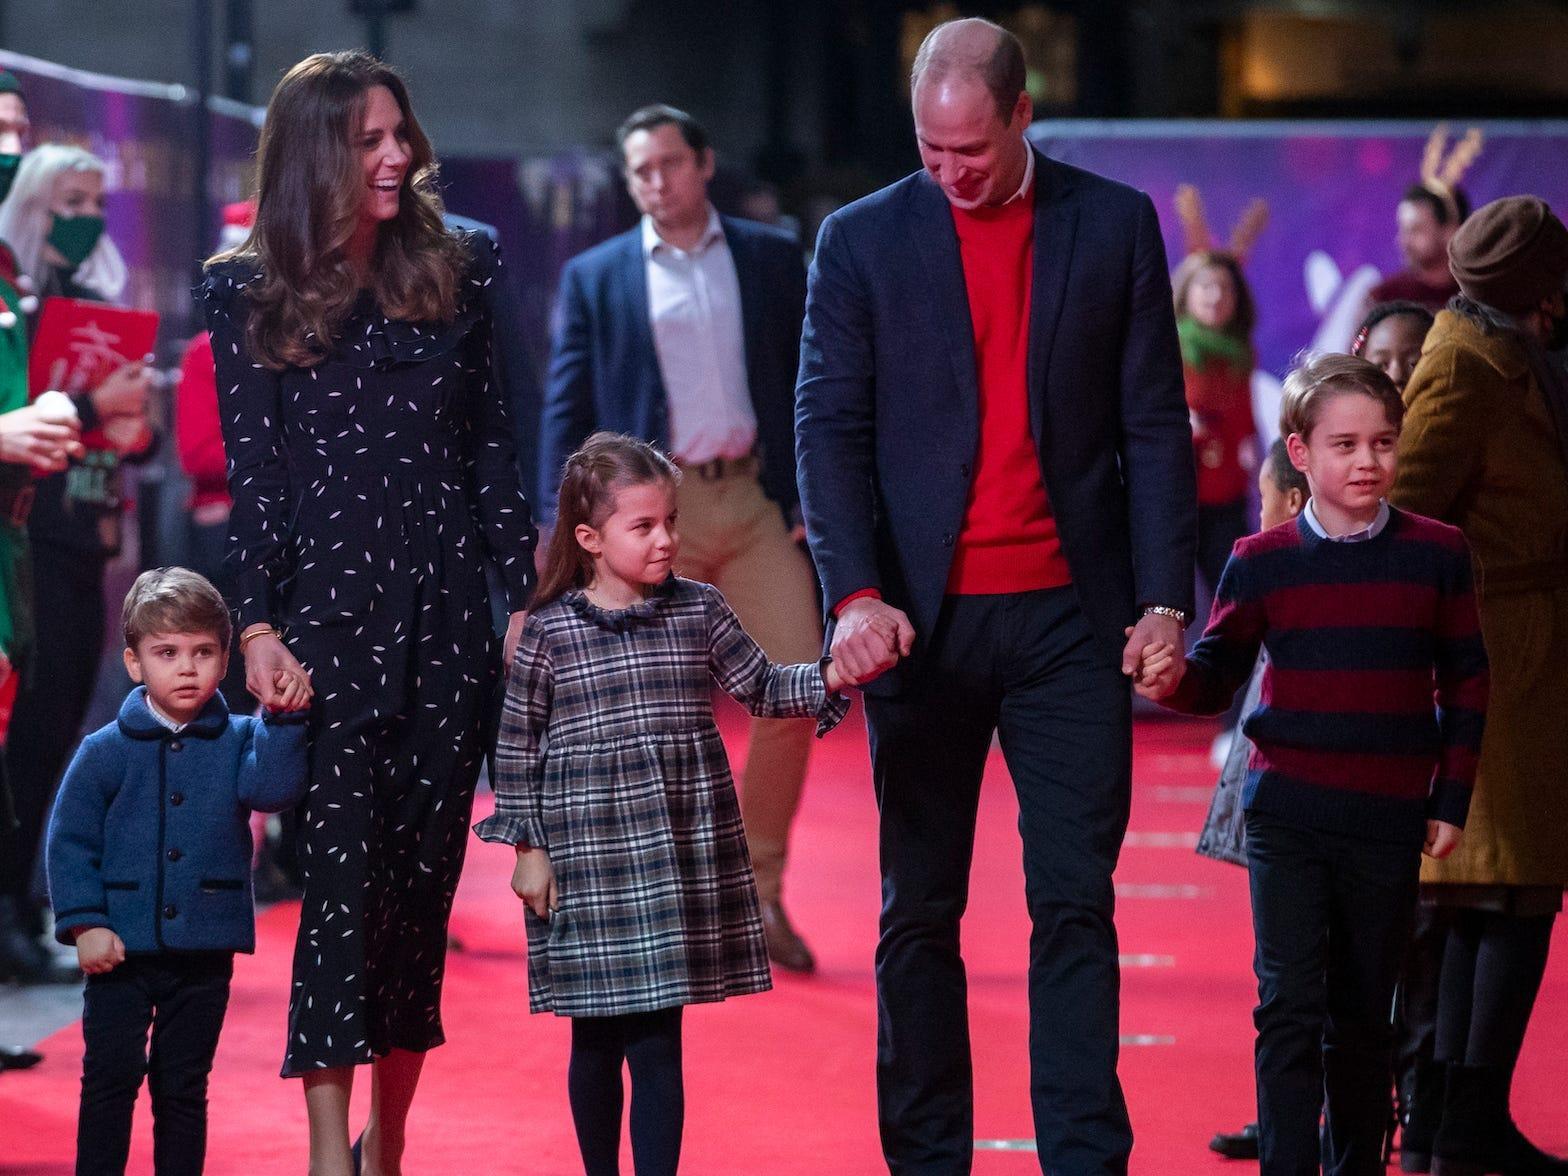 Prince George, Princess Charlotte, and Prince Louis walked ...